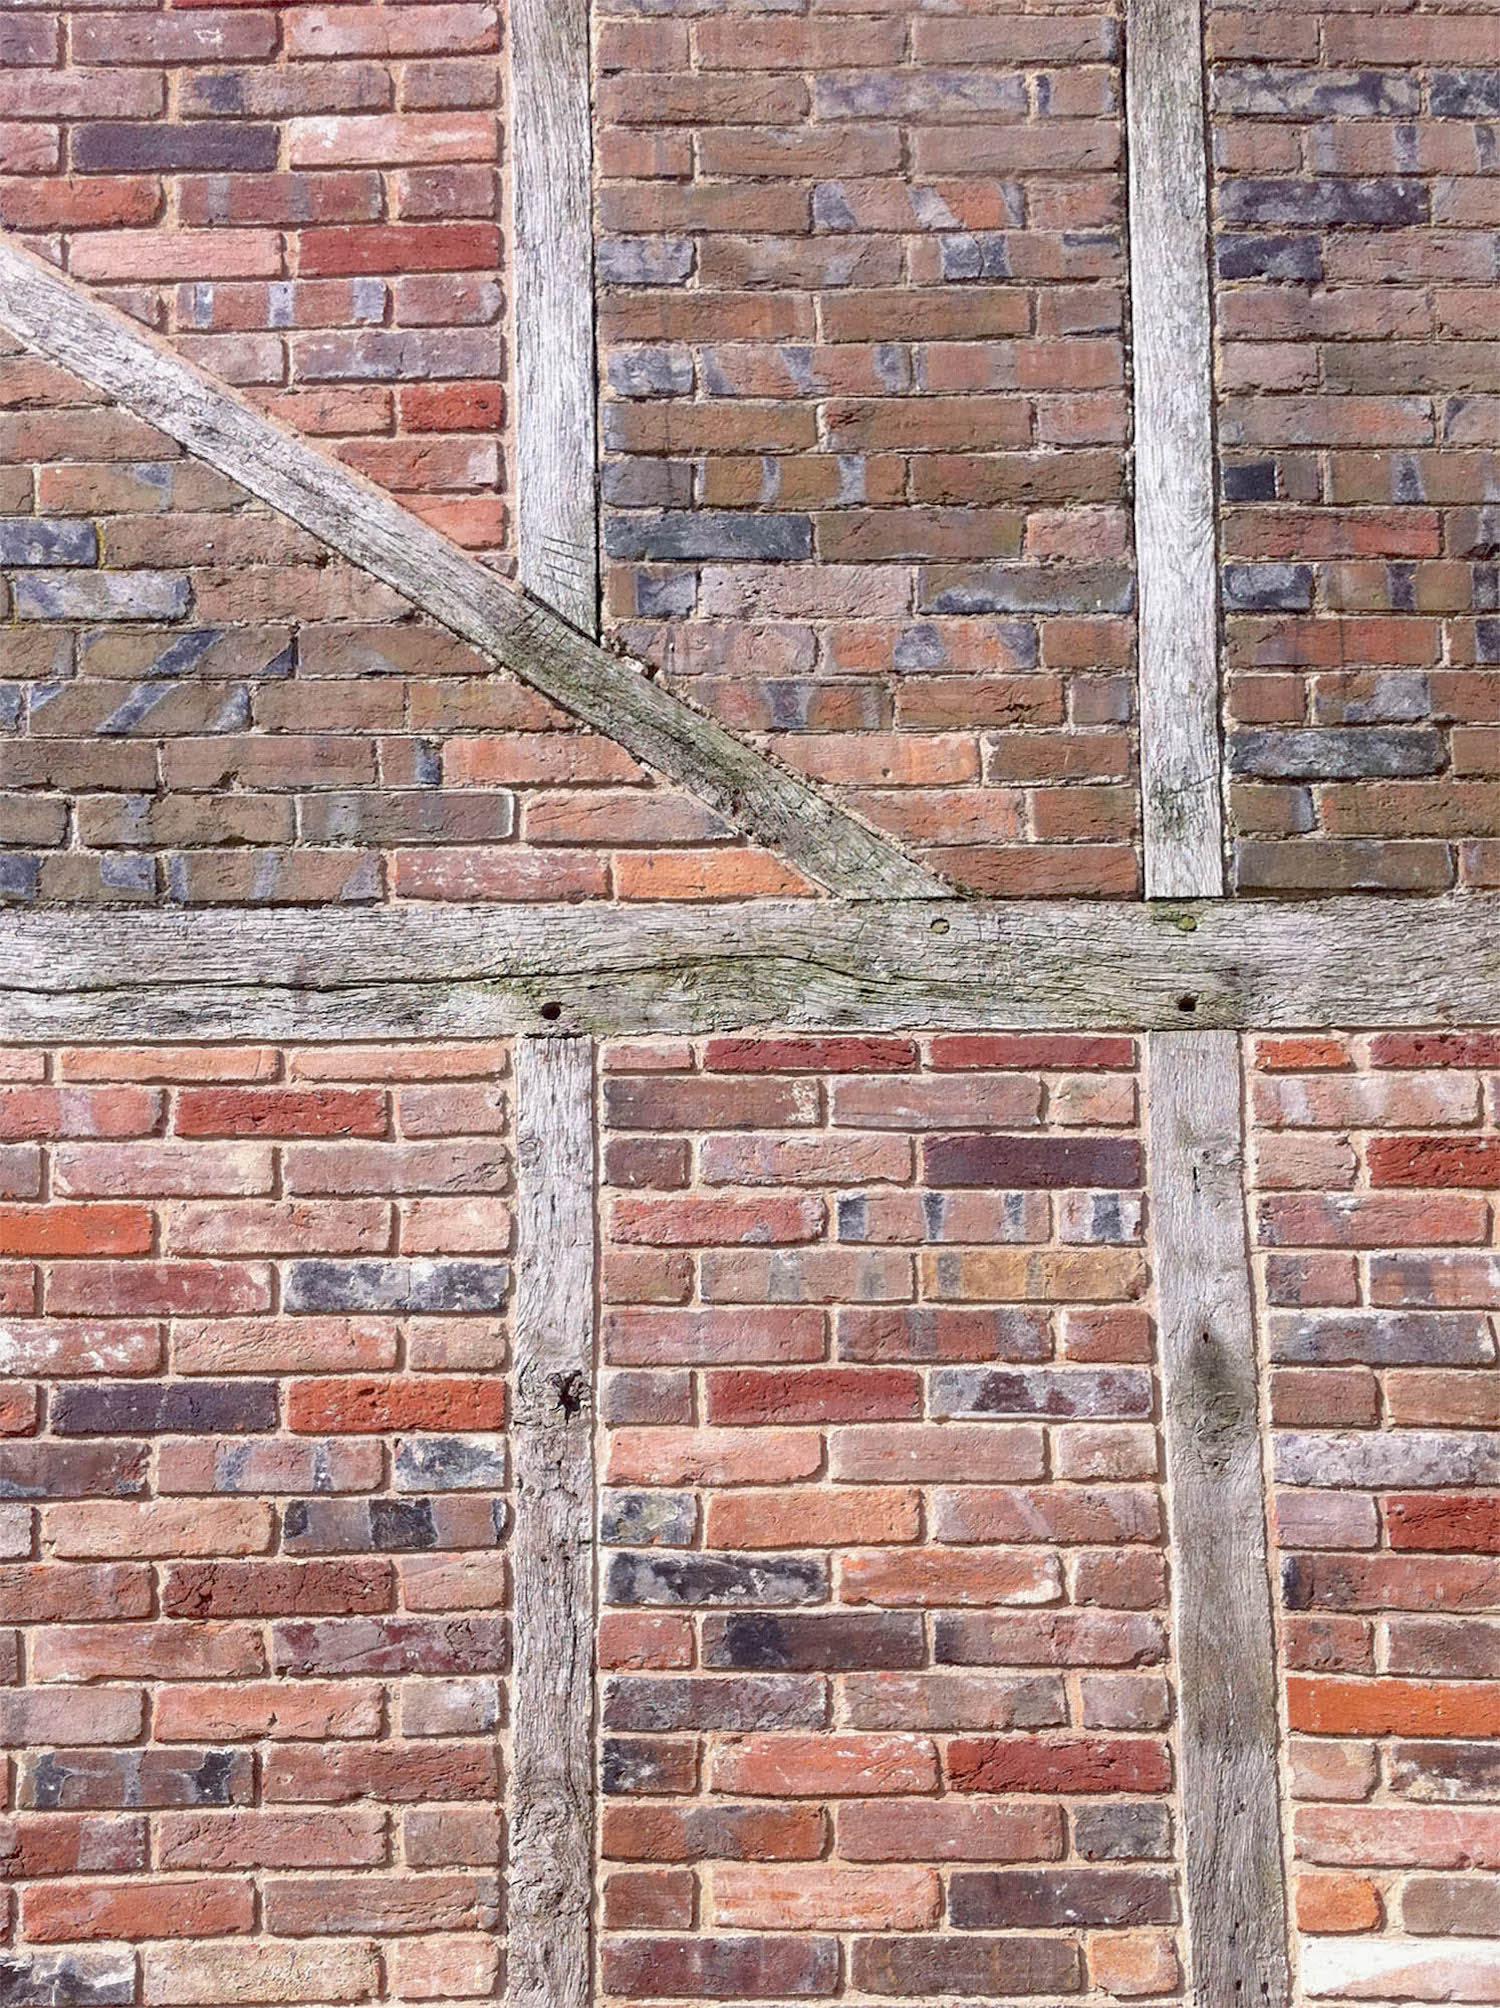 brickwork.jpeg